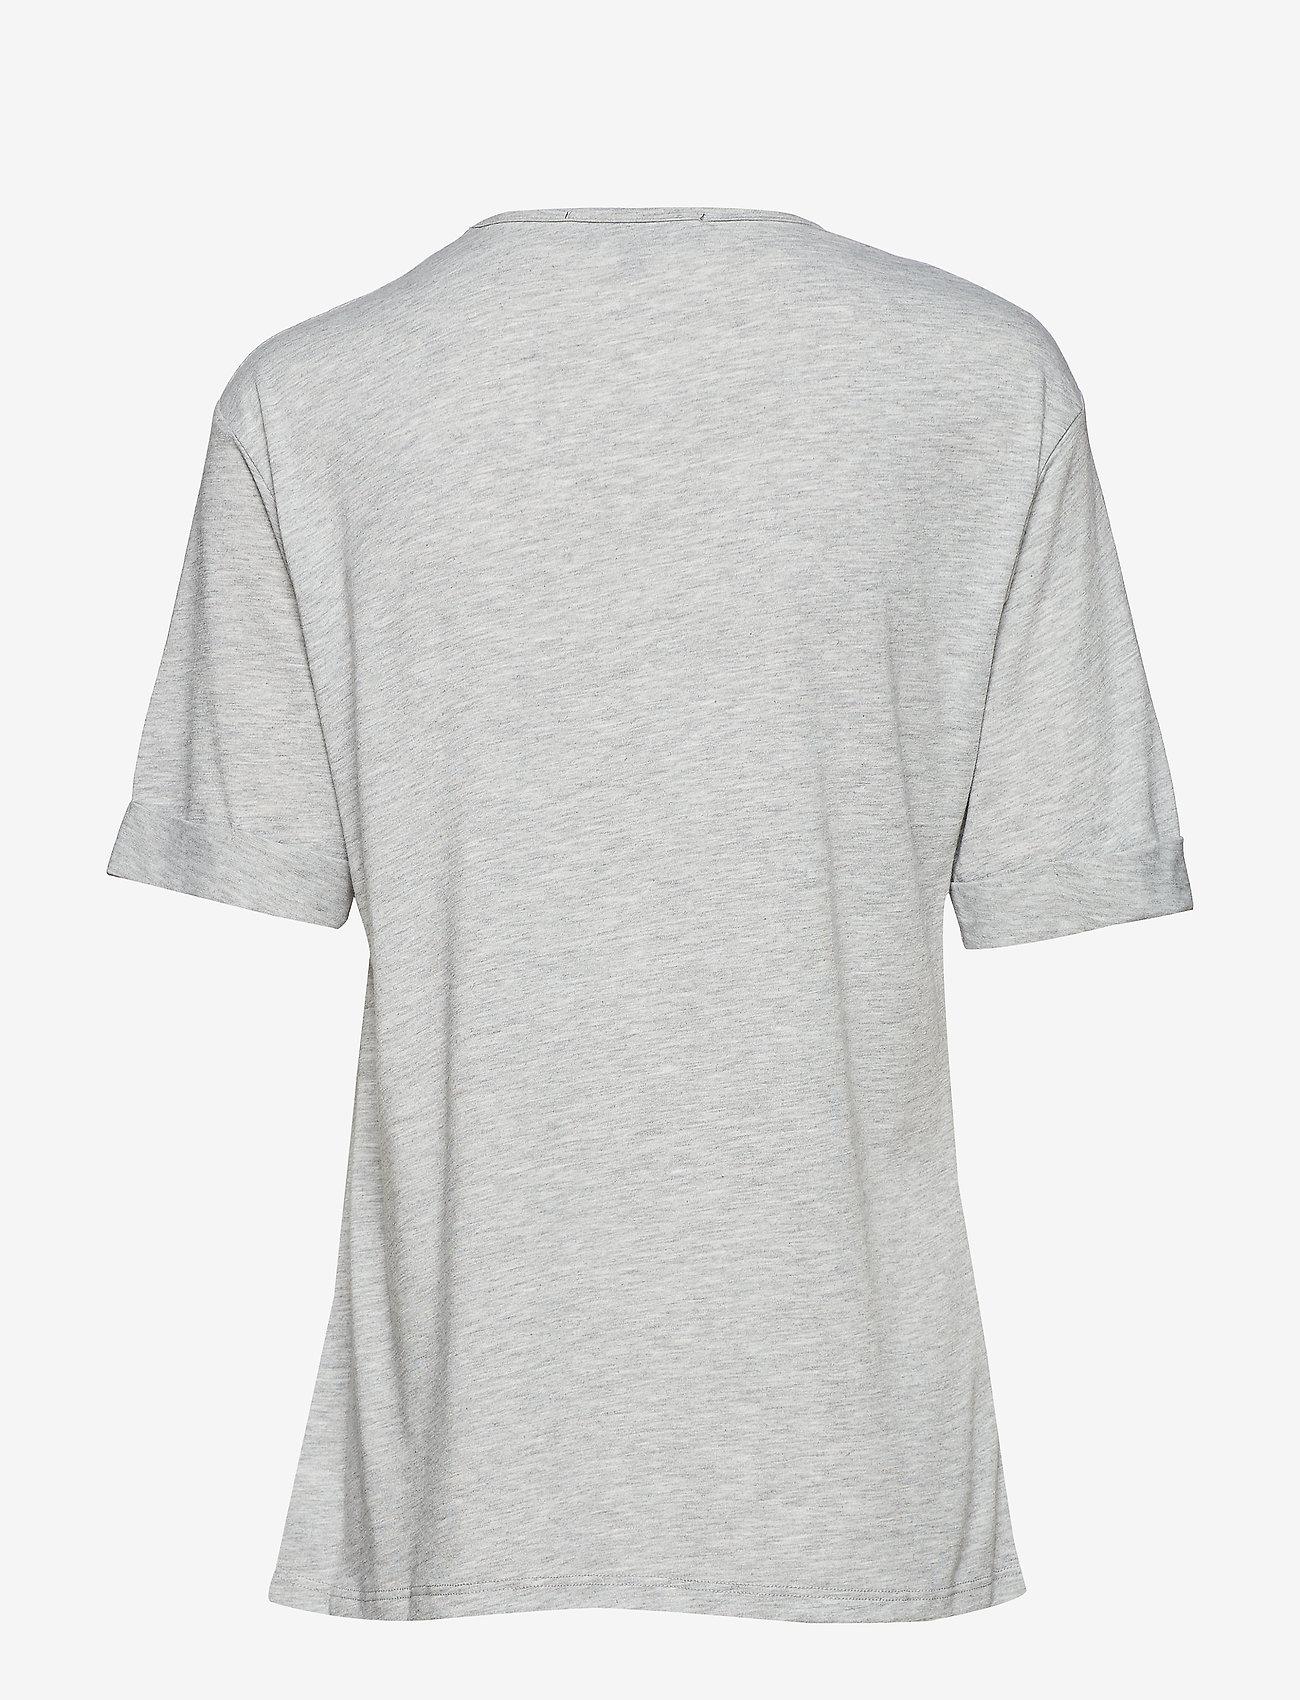 Soft Rebels - World T-shirt - printed t-shirts - 003 light grey